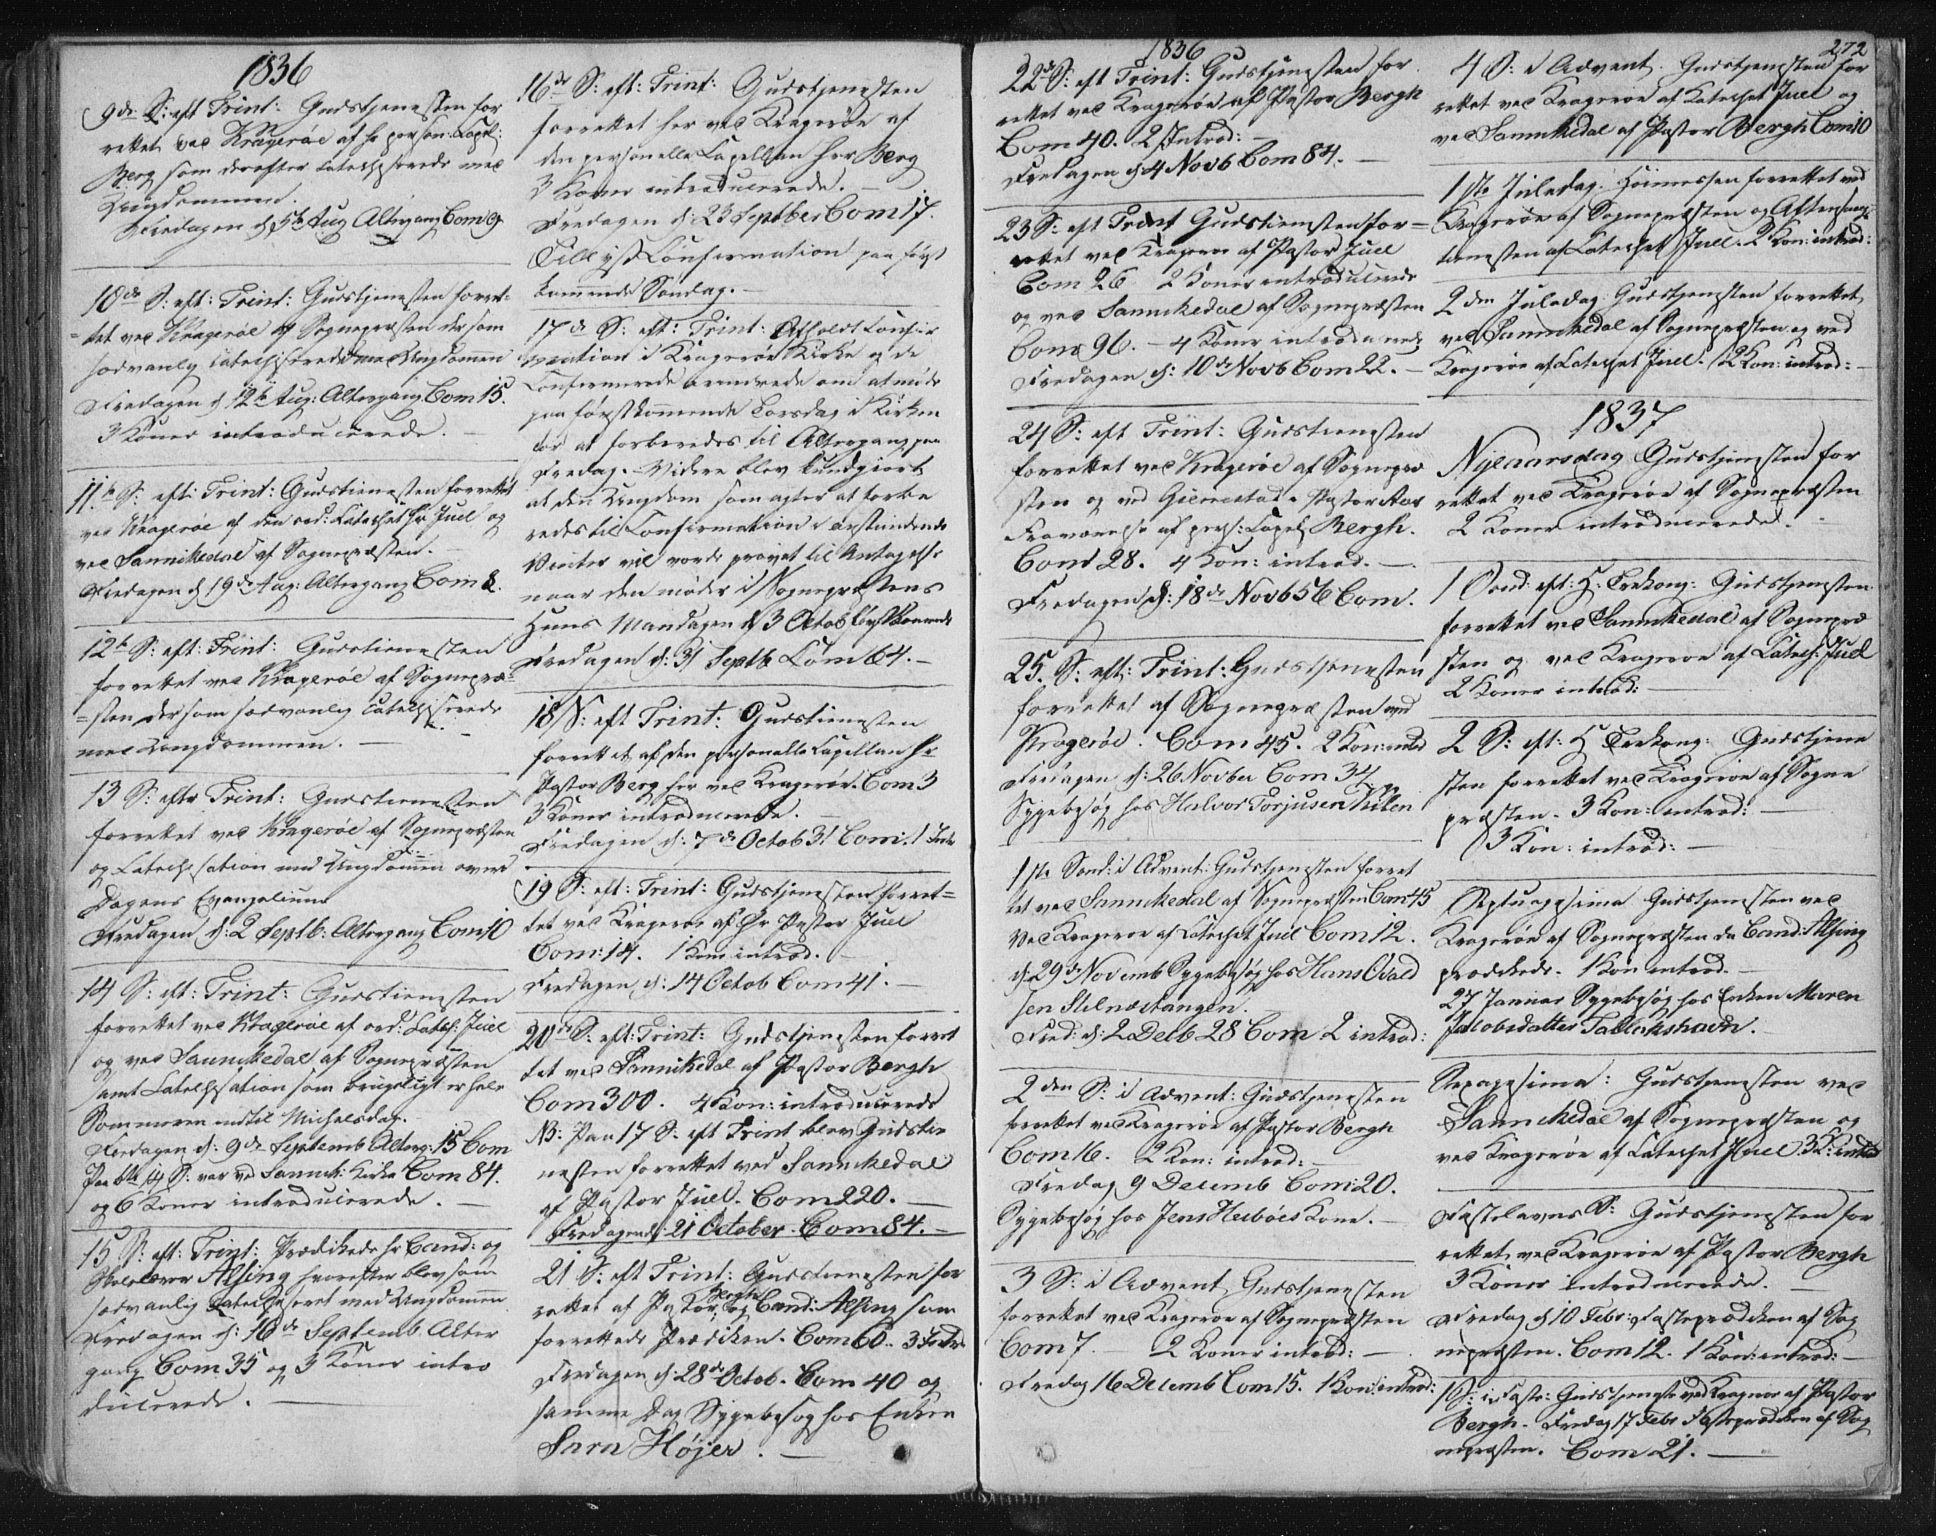 SAKO, Kragerø kirkebøker, F/Fa/L0005: Ministerialbok nr. 5, 1832-1847, s. 272